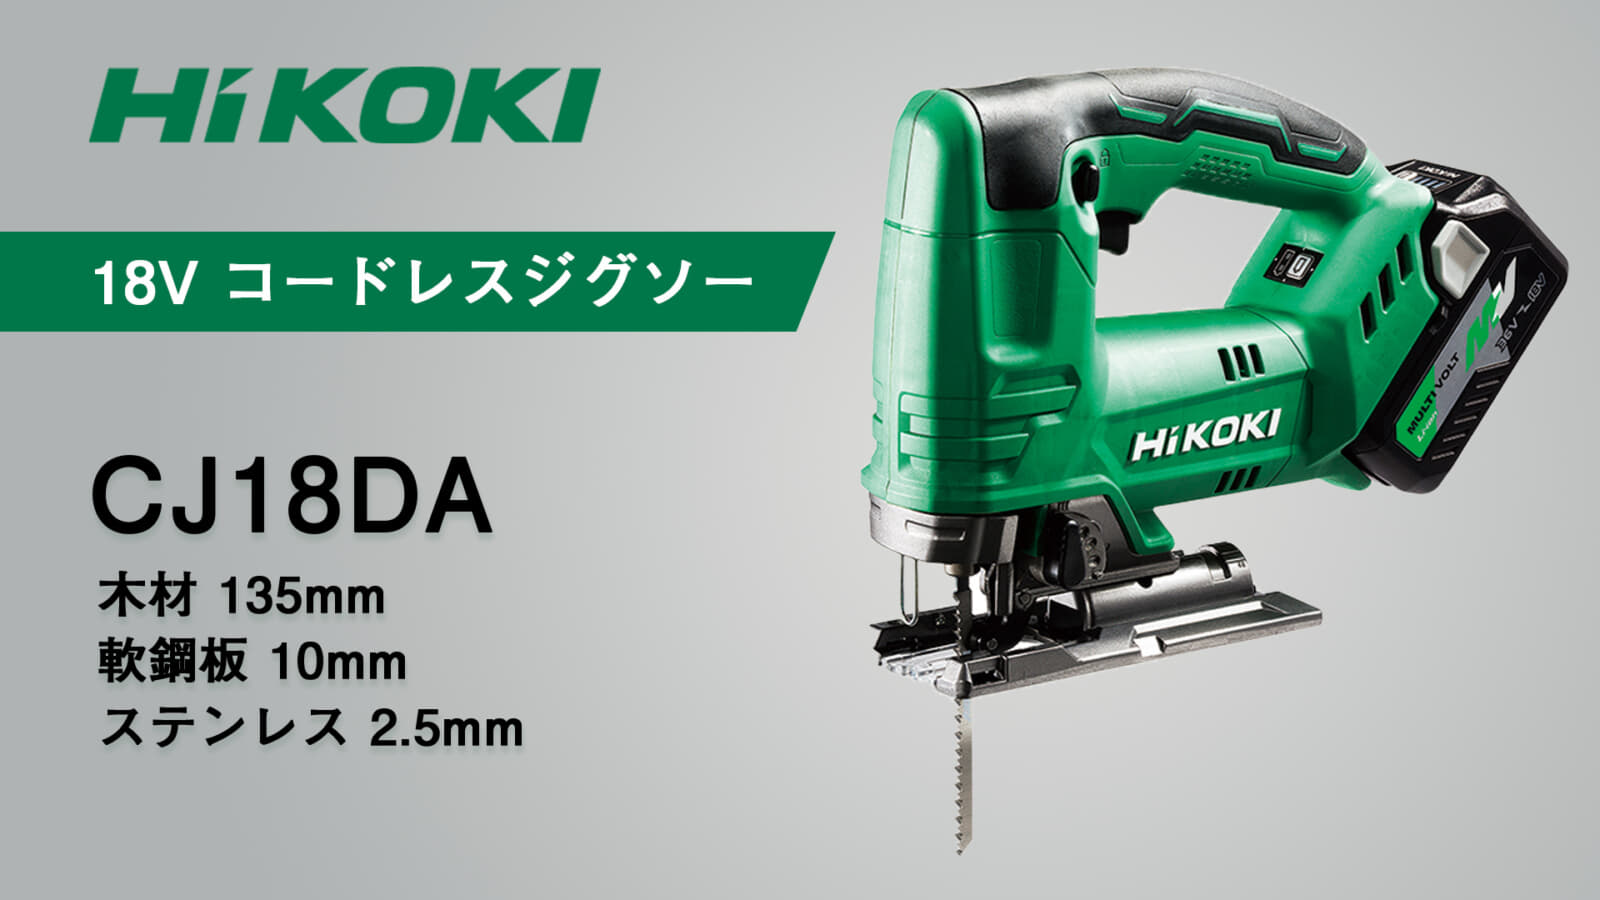 HiKOKI CJ18DA 18Vコードレスジグソーを発売